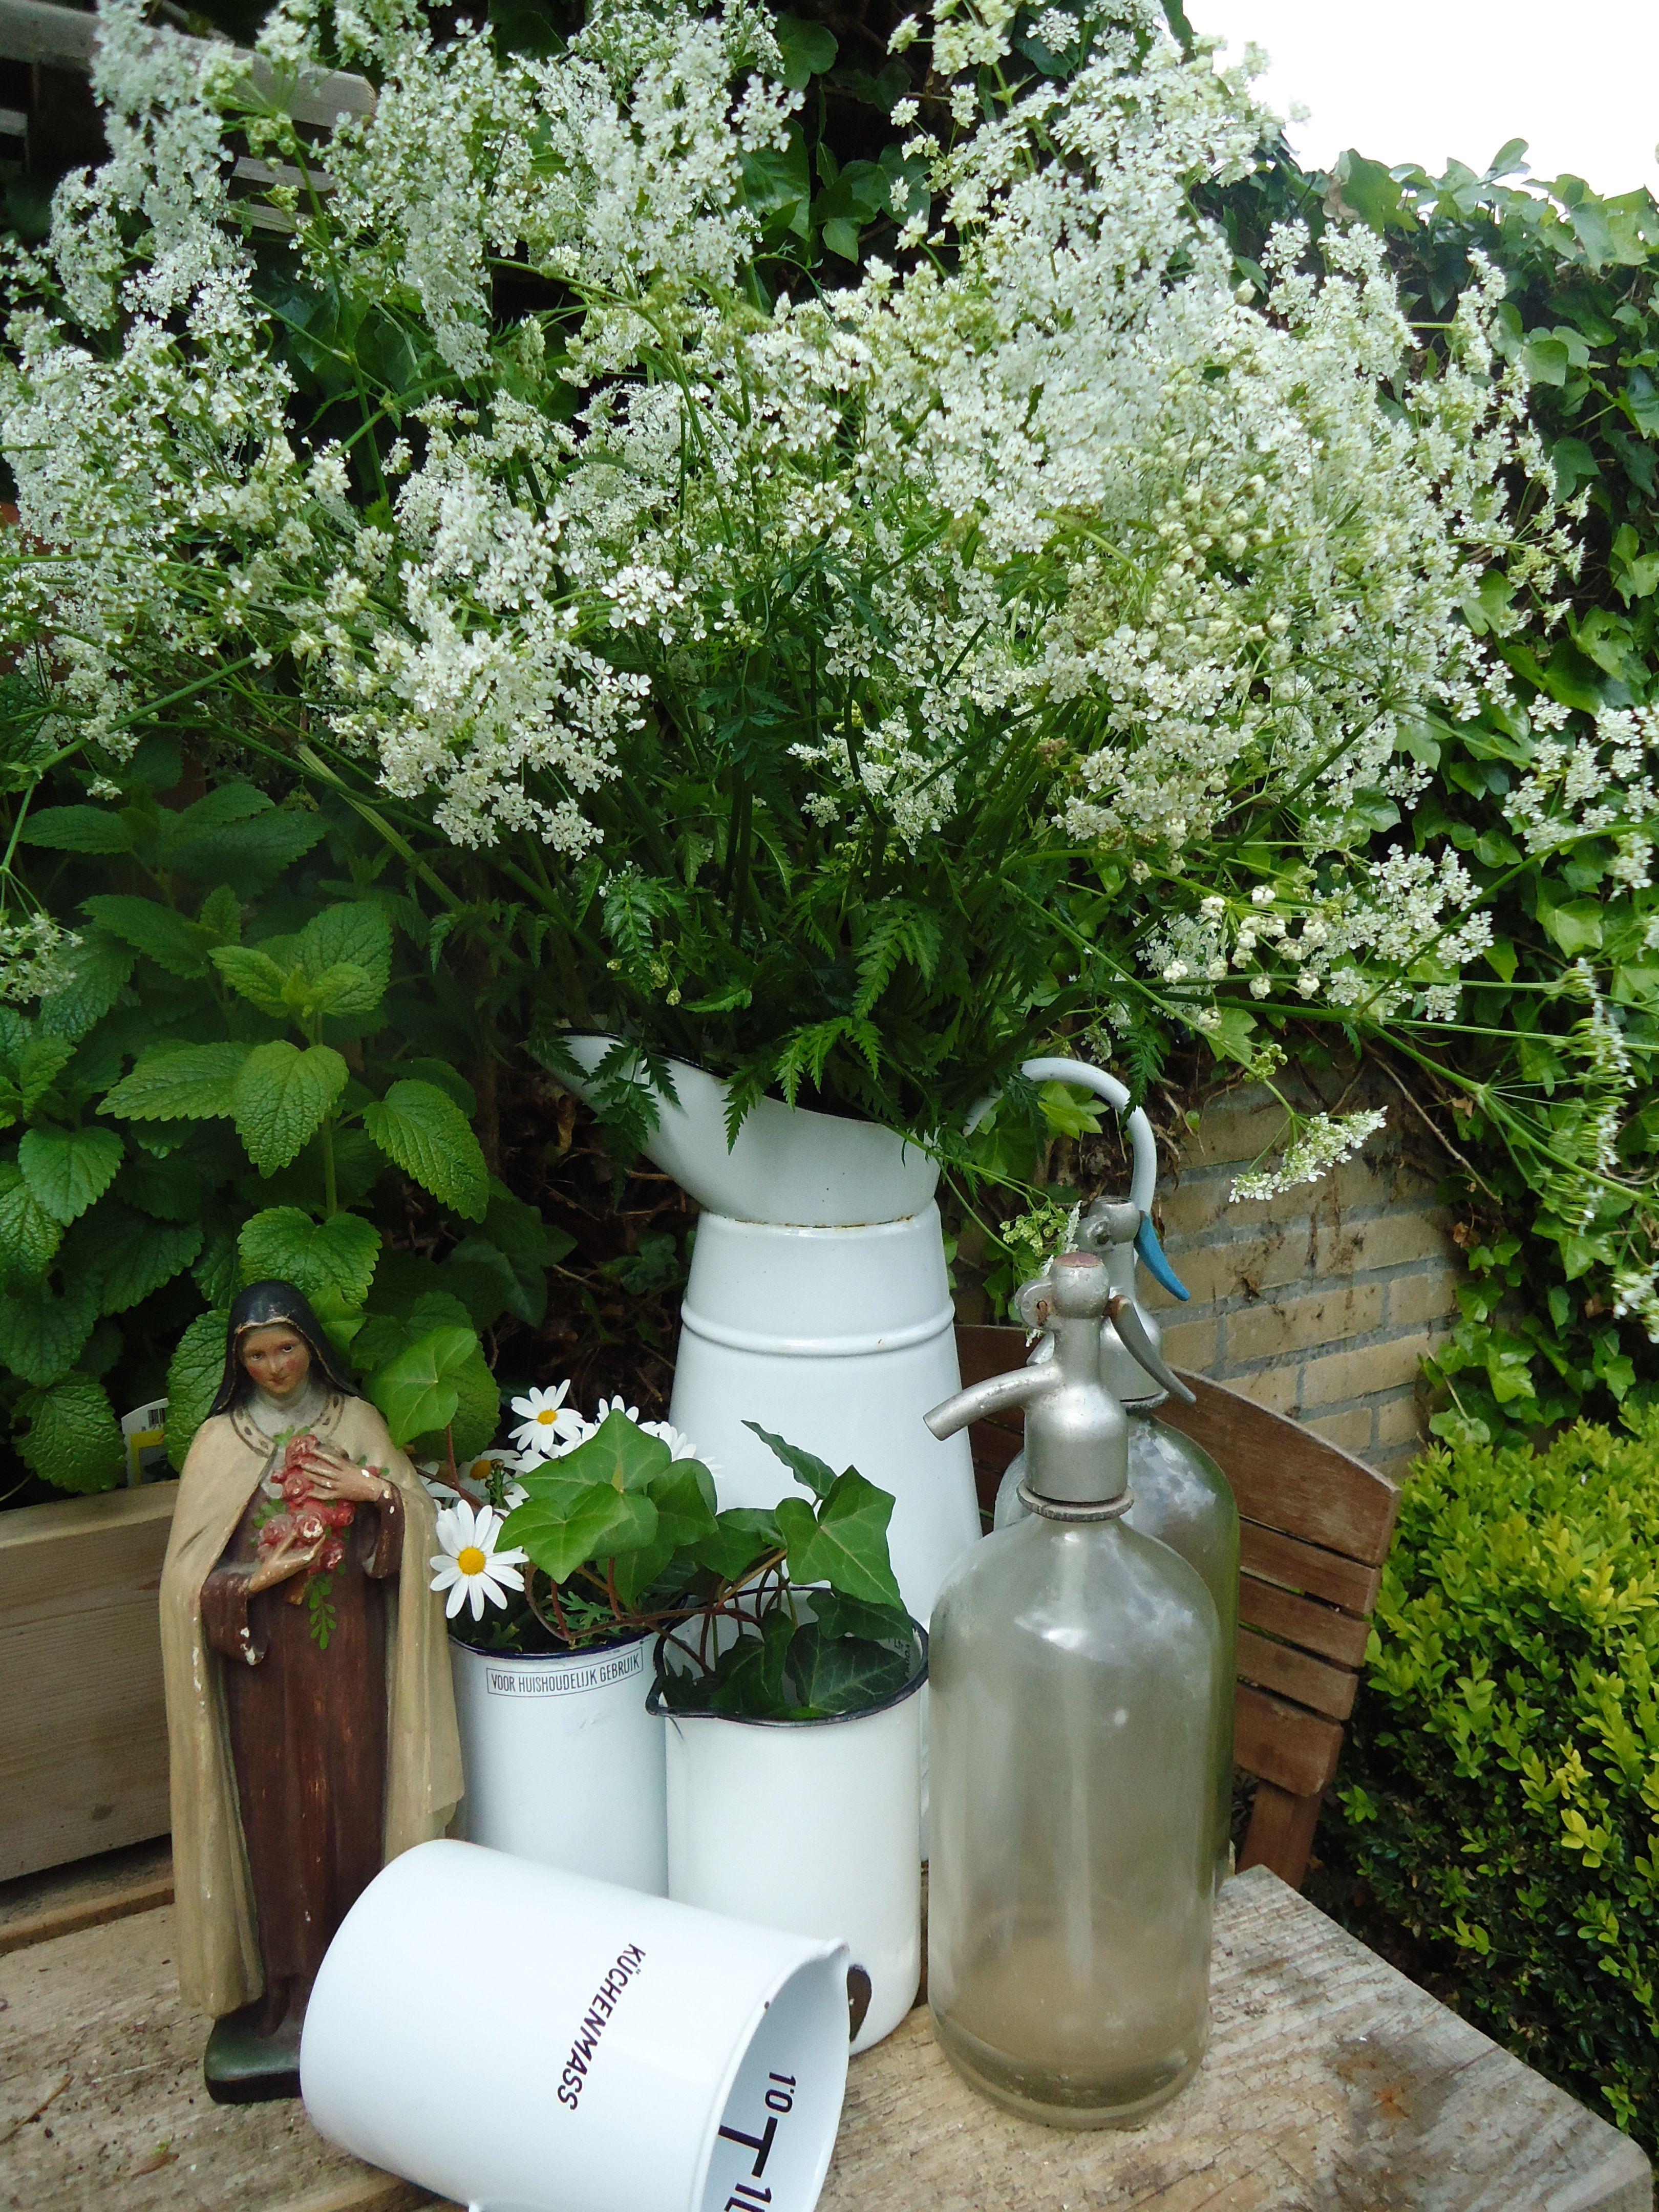 mazztuinmeubelen inspiratie outside decorations garden tuindecoratie tuin home on zink outdoor kitchen id=90107